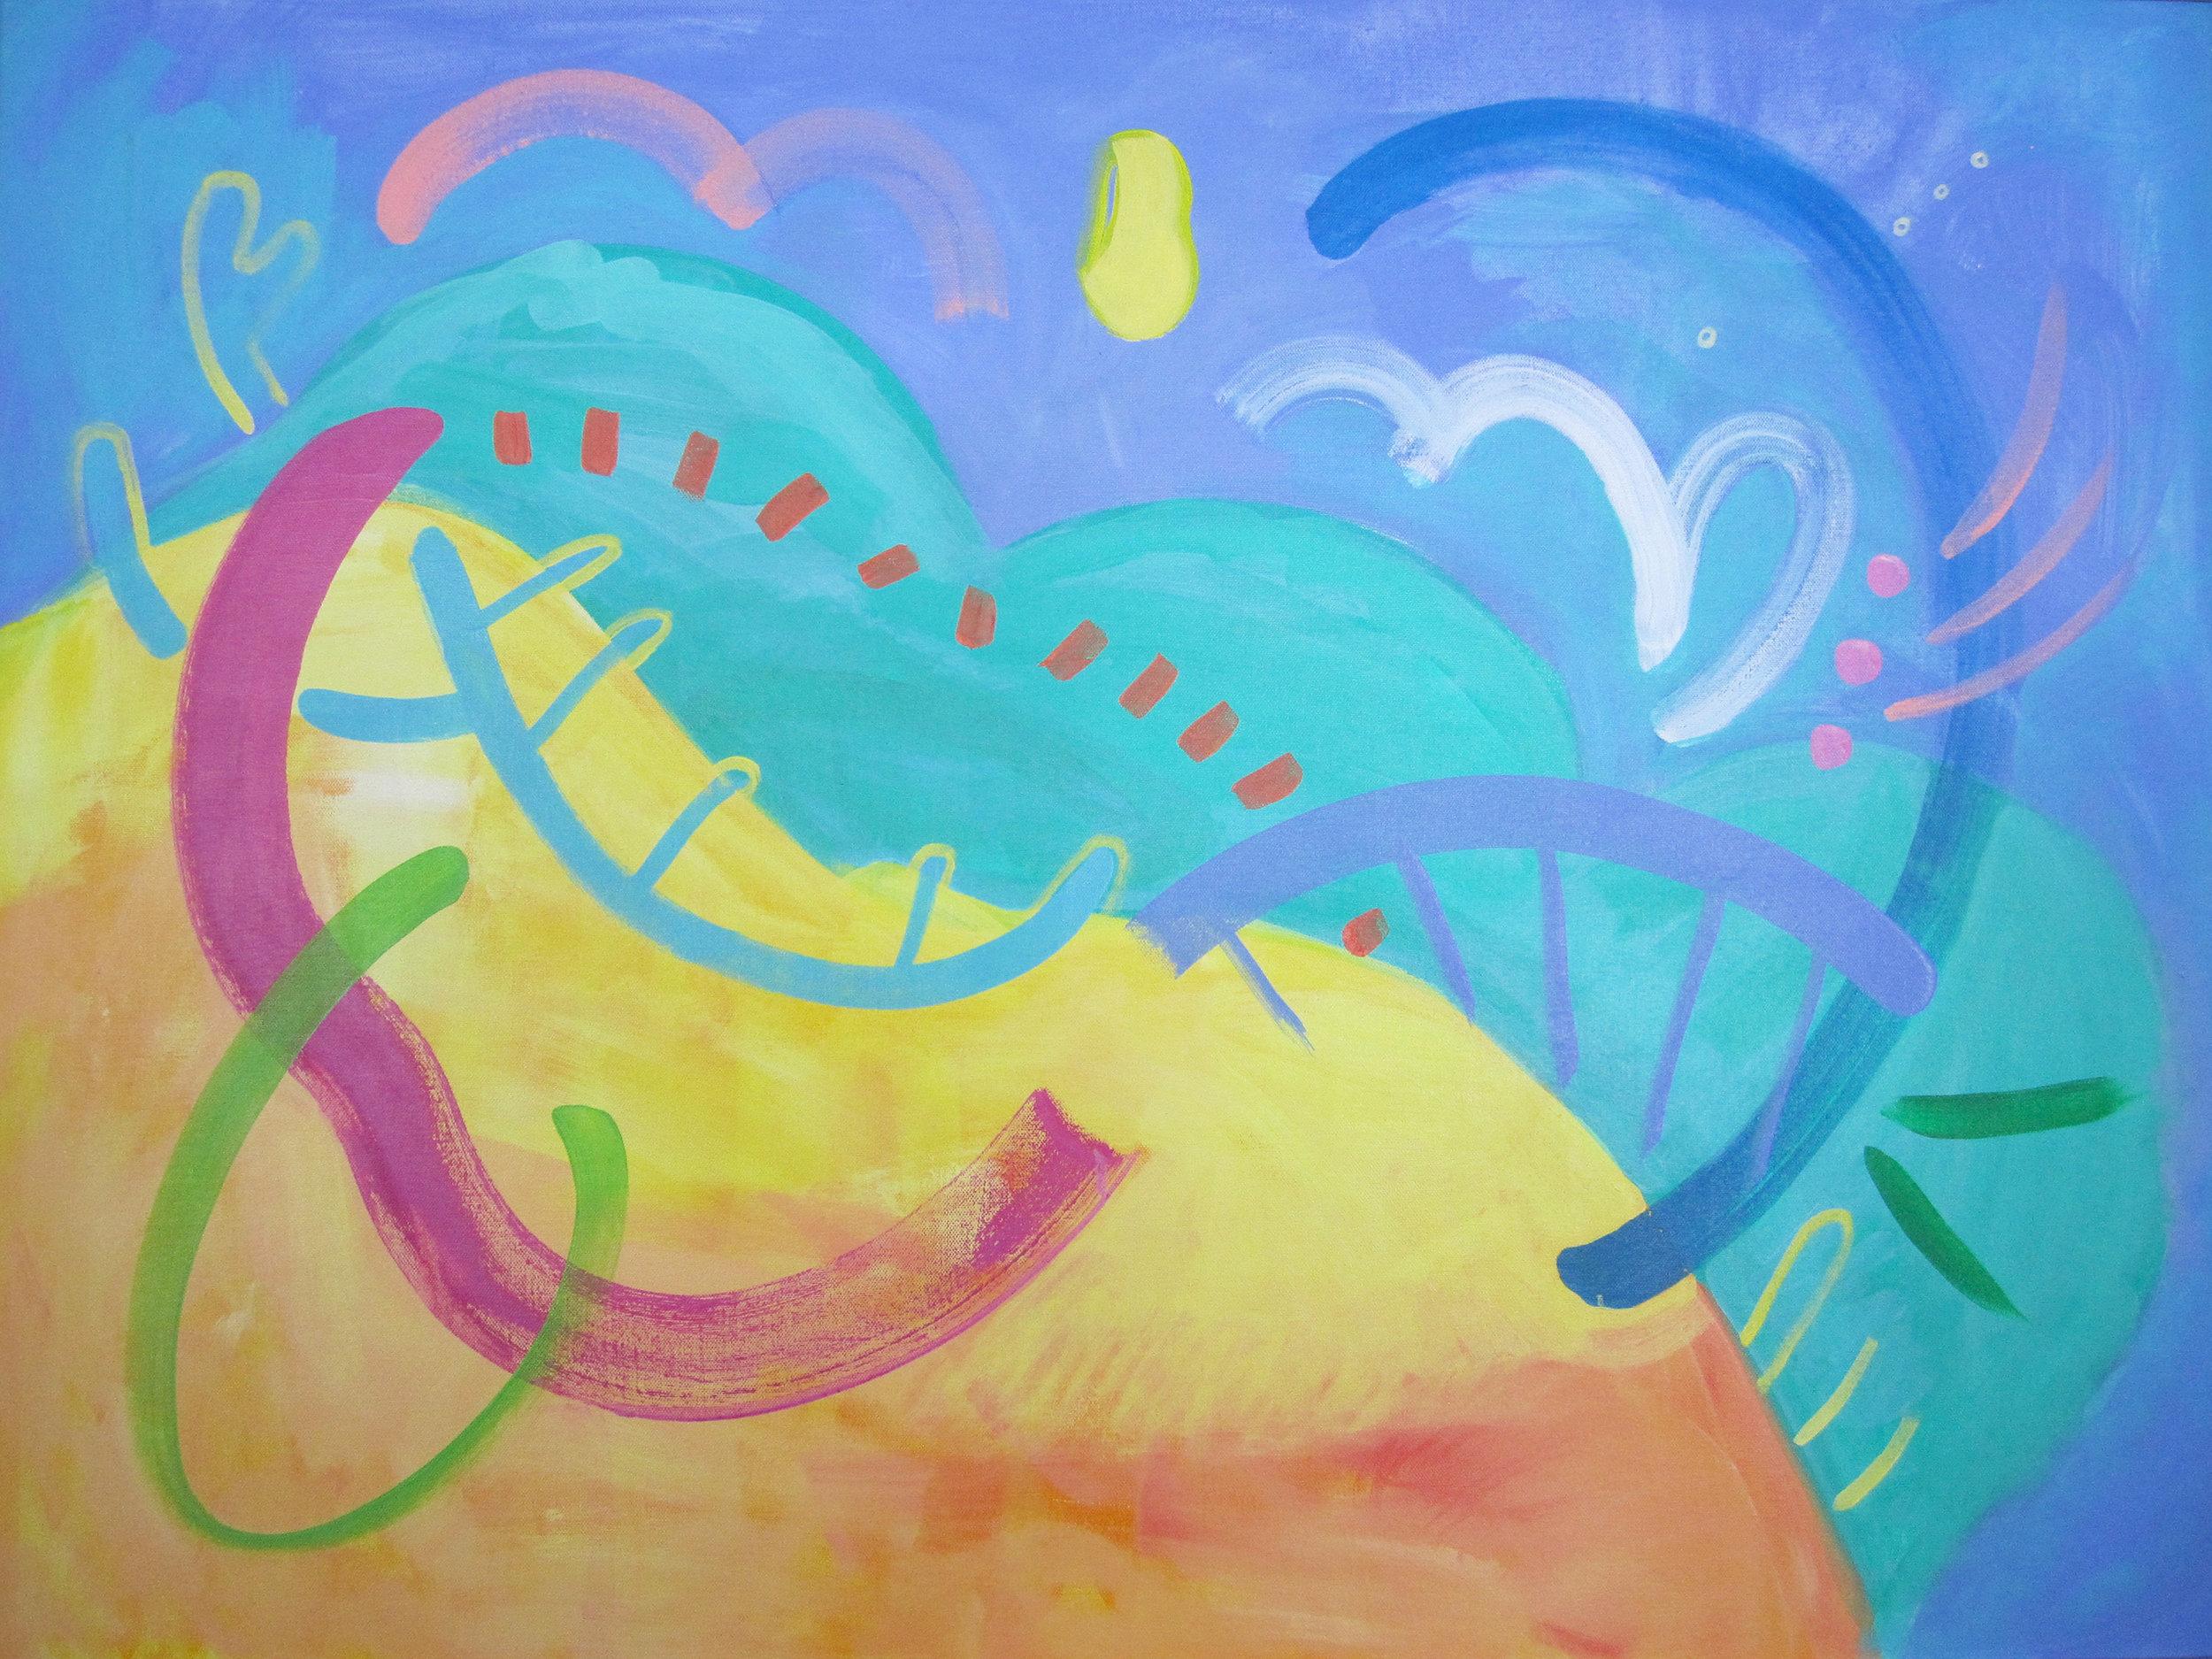 "Tipsy Turvey, 40"" x 30"", Acrylic on Canvas, 2016"